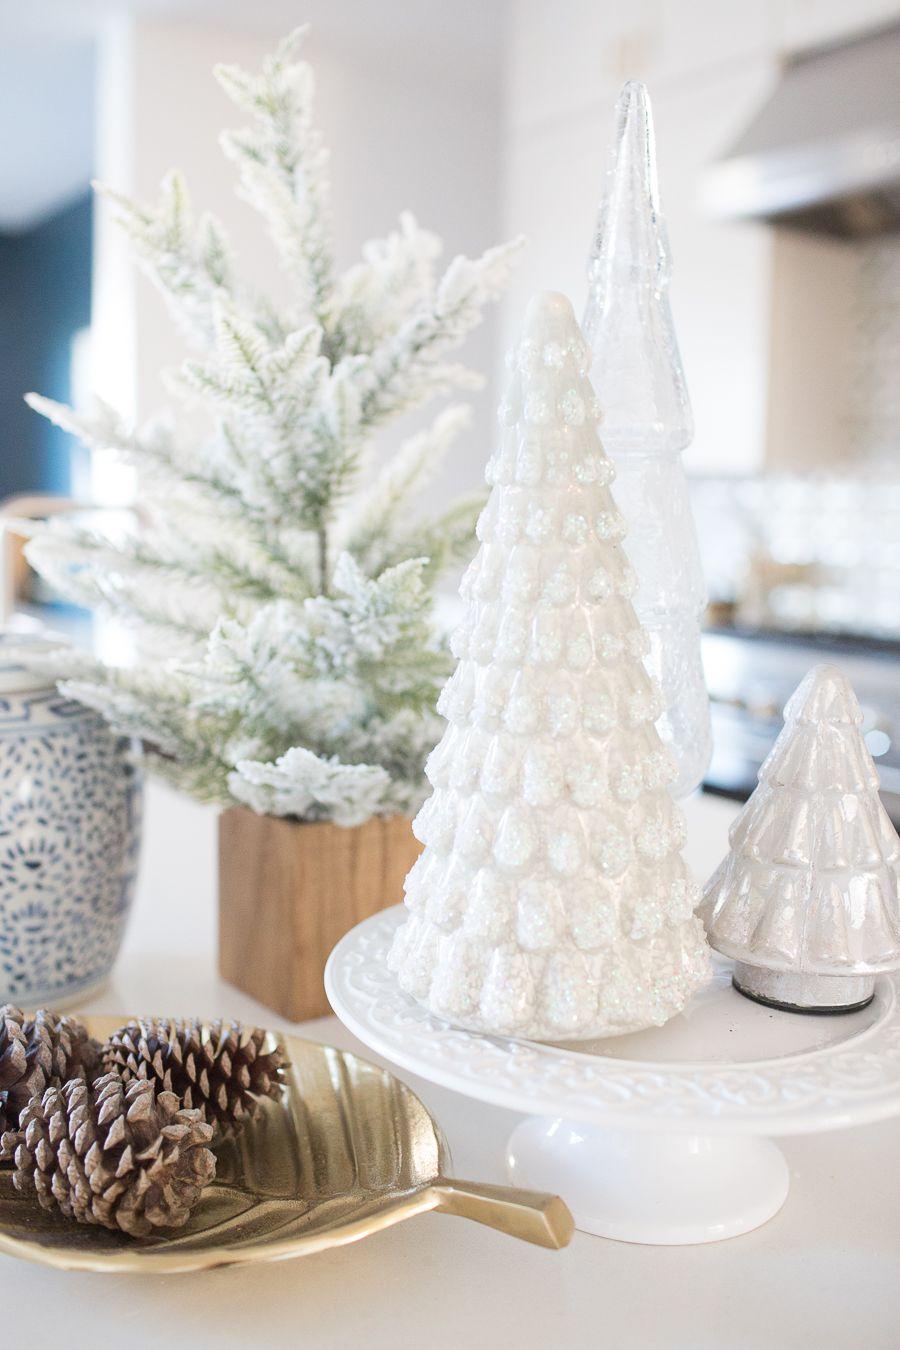 10 Tips for Budget Christmas Decorating | xmas | Pinterest | Design ...